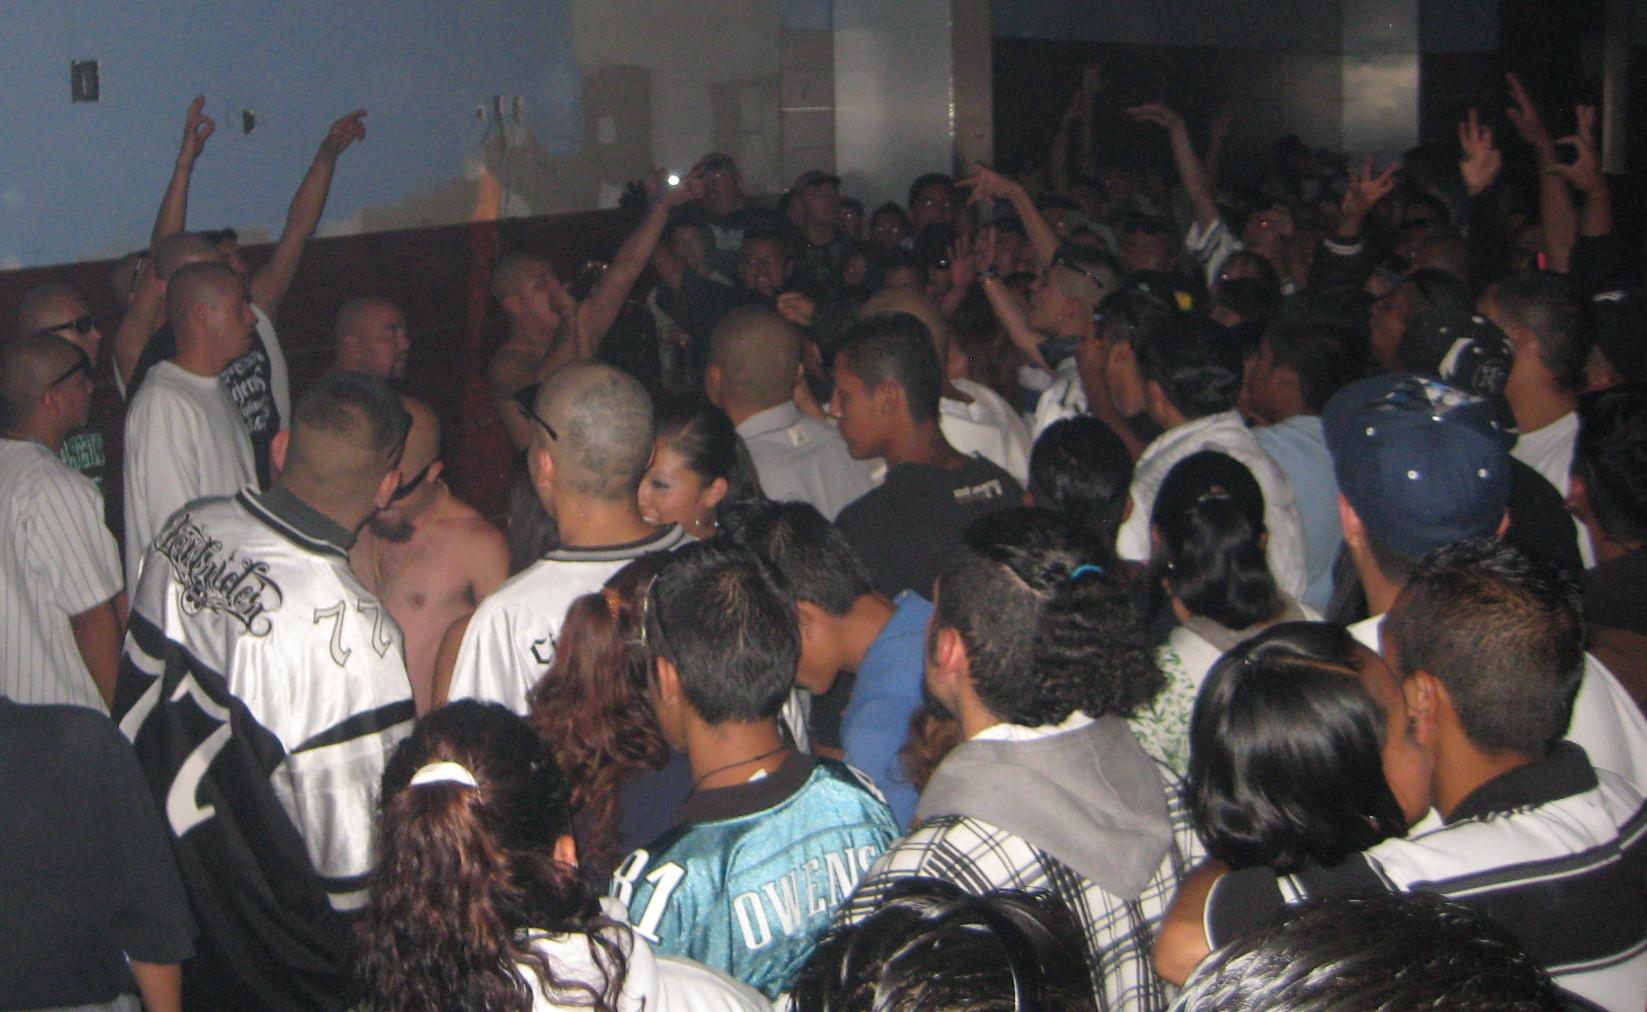 gangs, mexico city gangs, mexico city hiphop, cholo rap